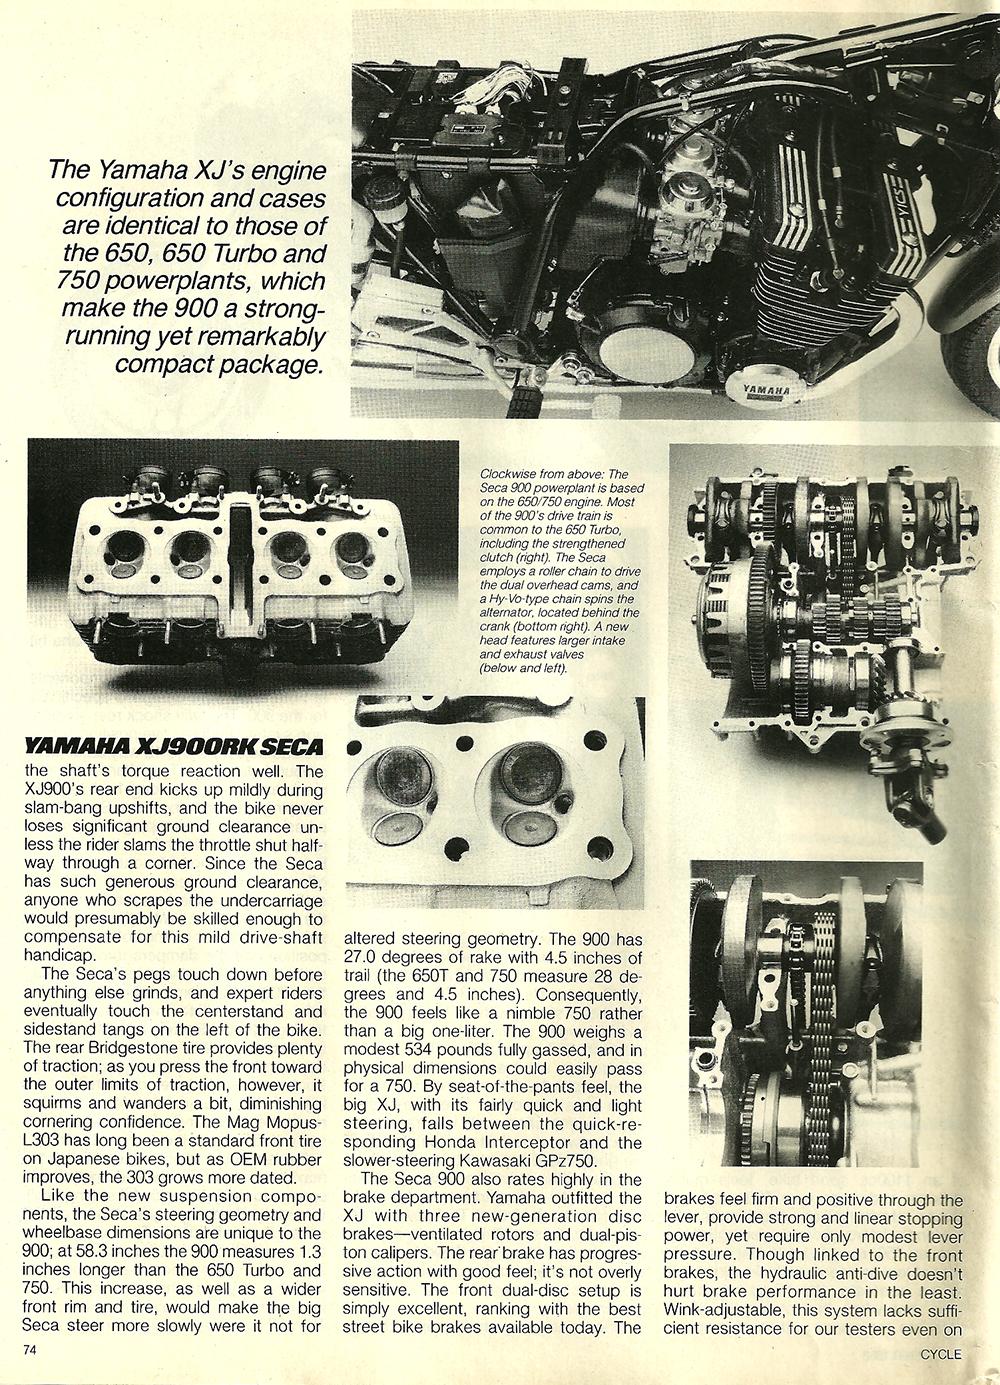 1983 Yamaha XJ900RK Seca road test 5.jpg